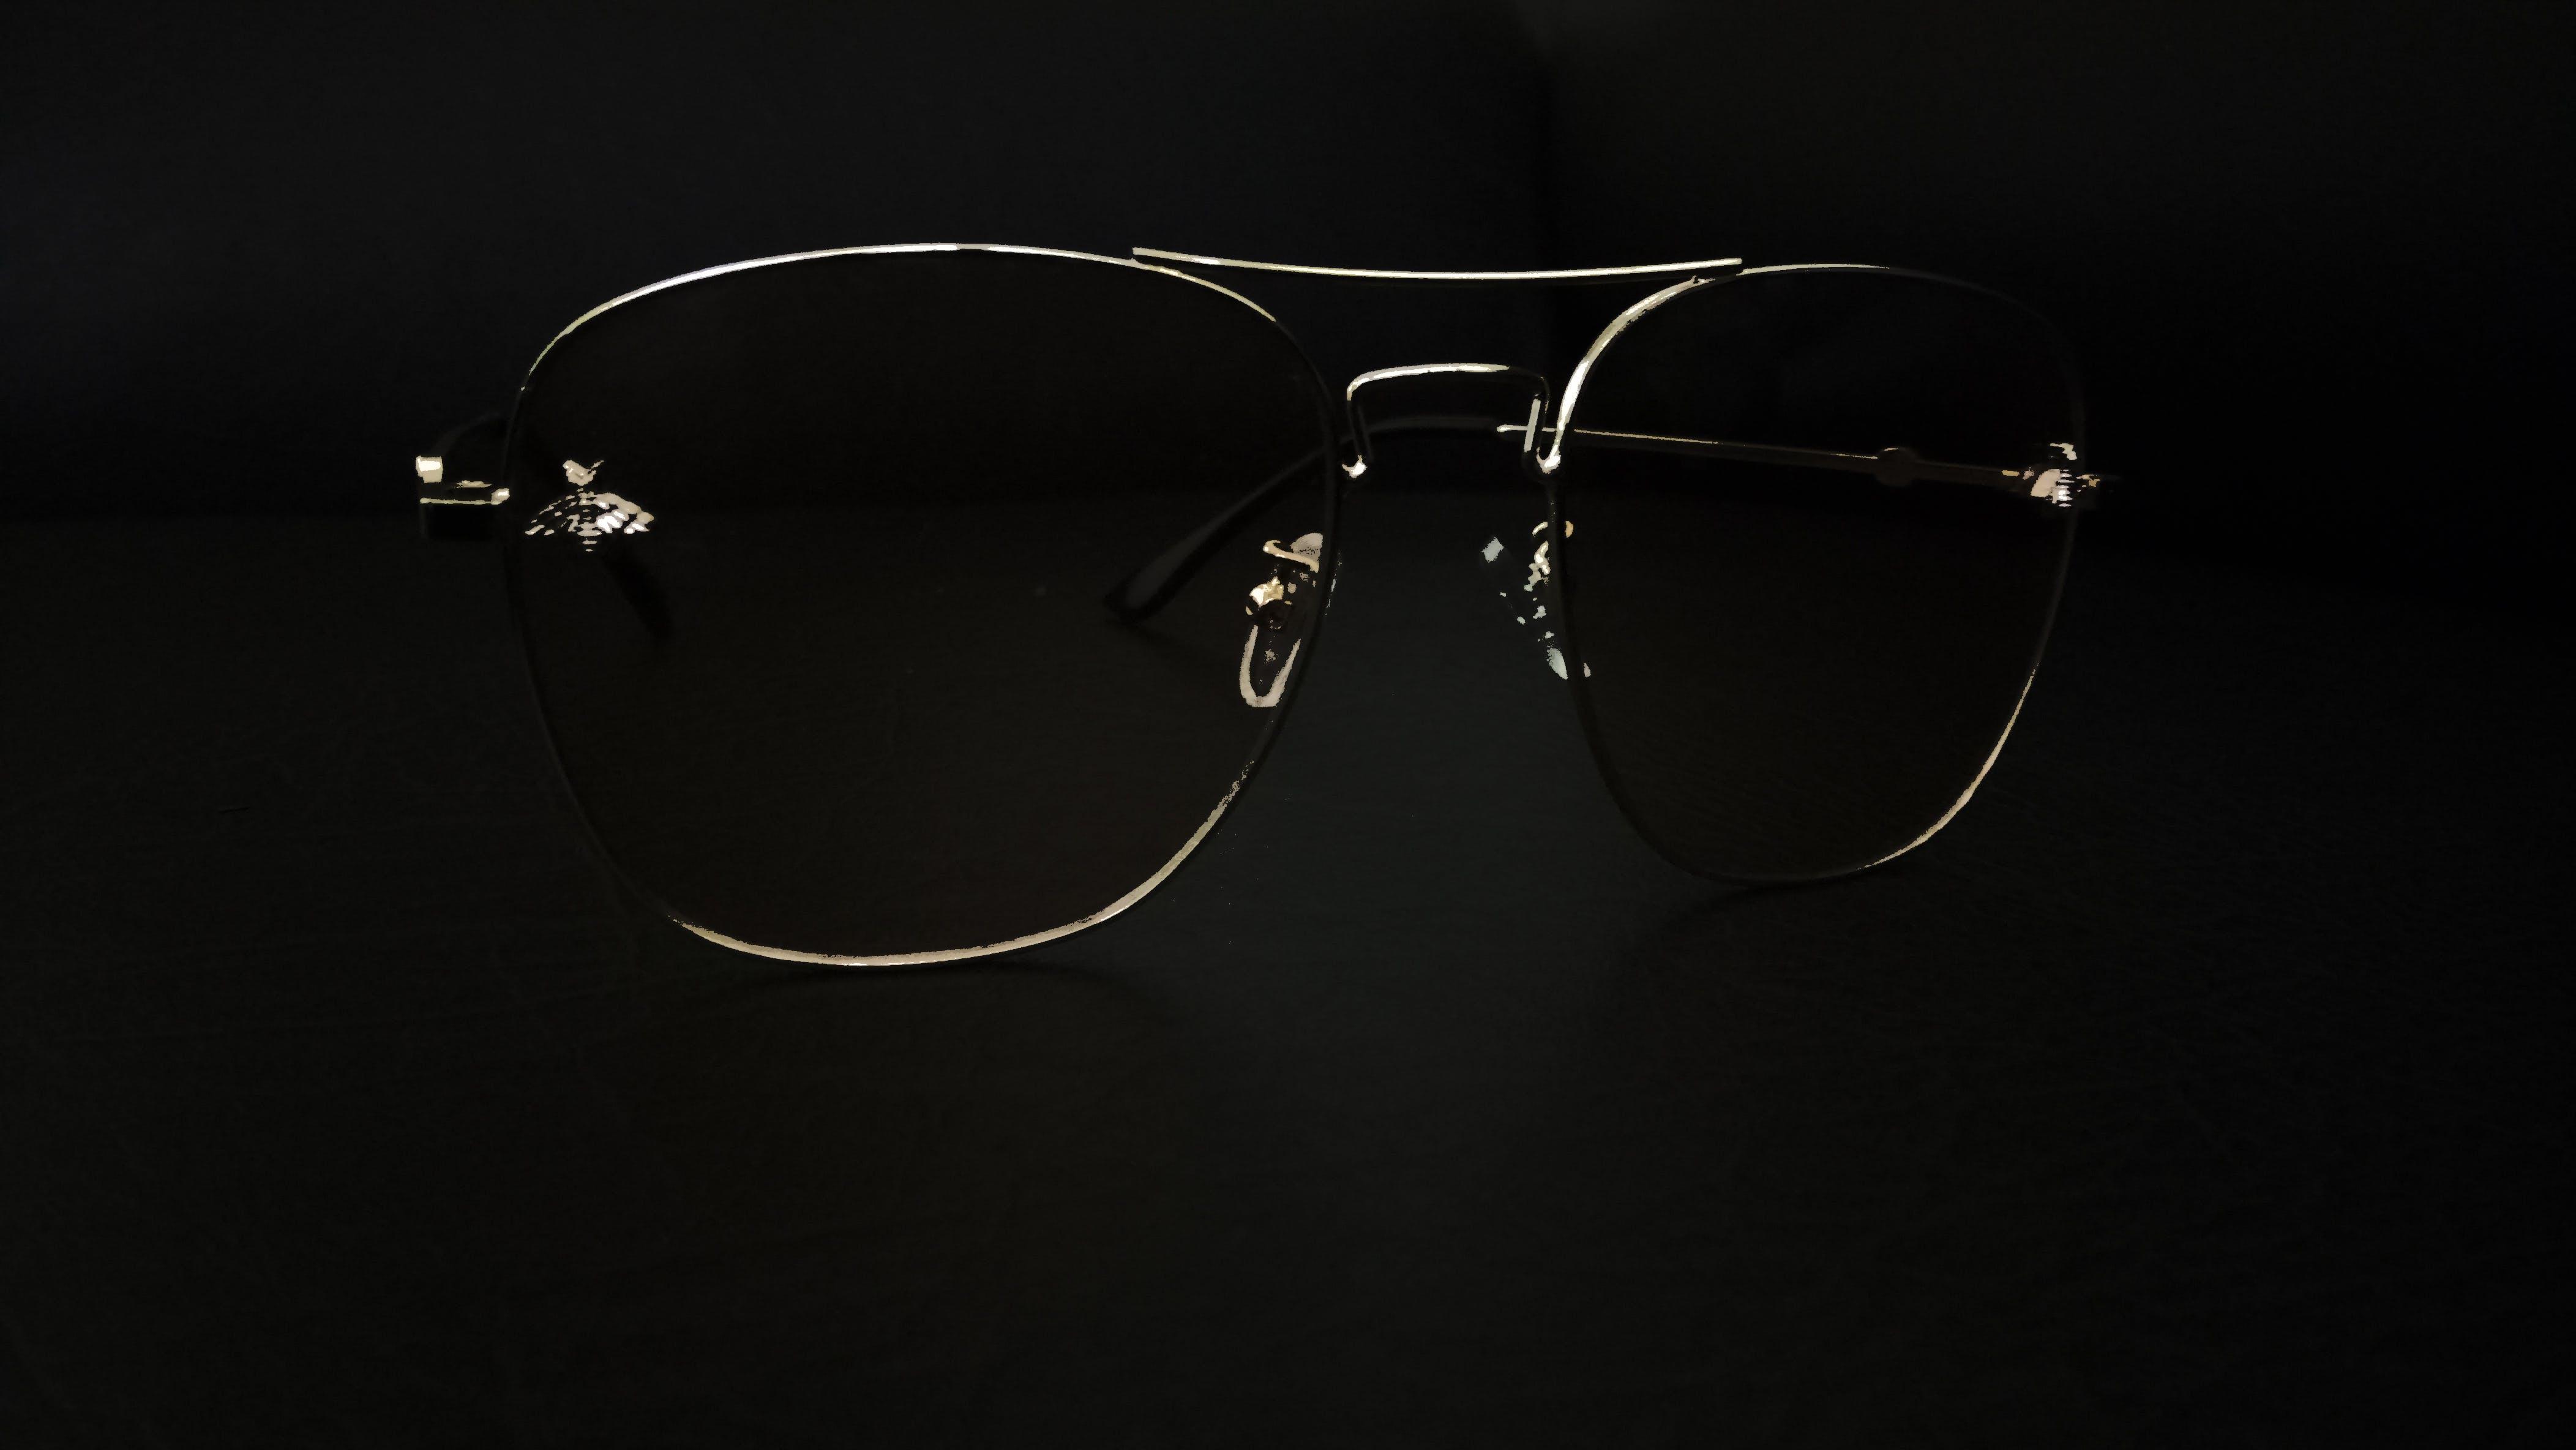 Free stock photo of black and white, sun glasses